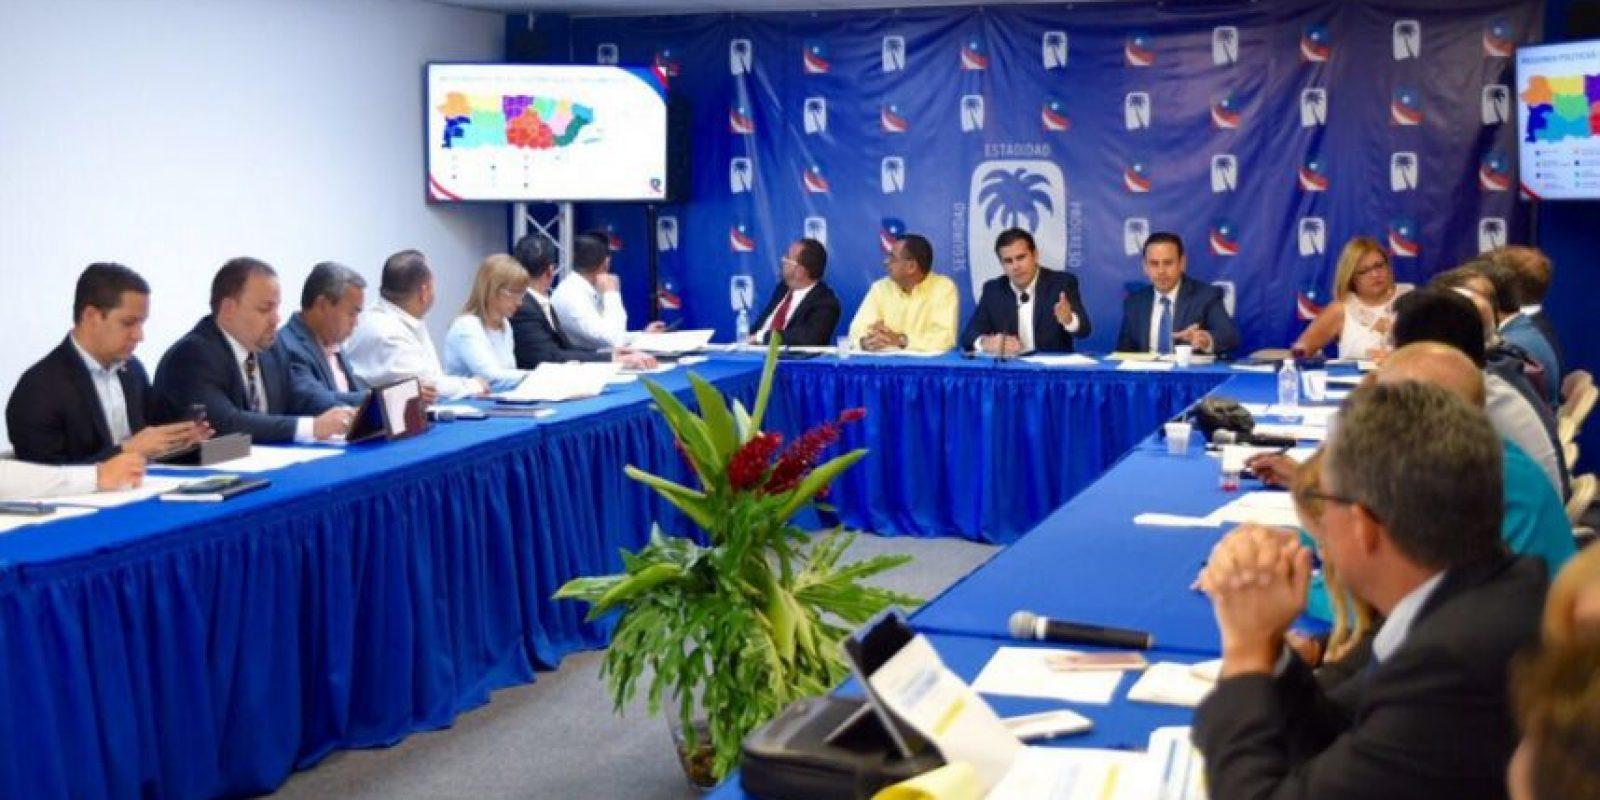 Reunión directorio PNP Foto:Tomada de Twitter @ricardorossello. Imagen Por: